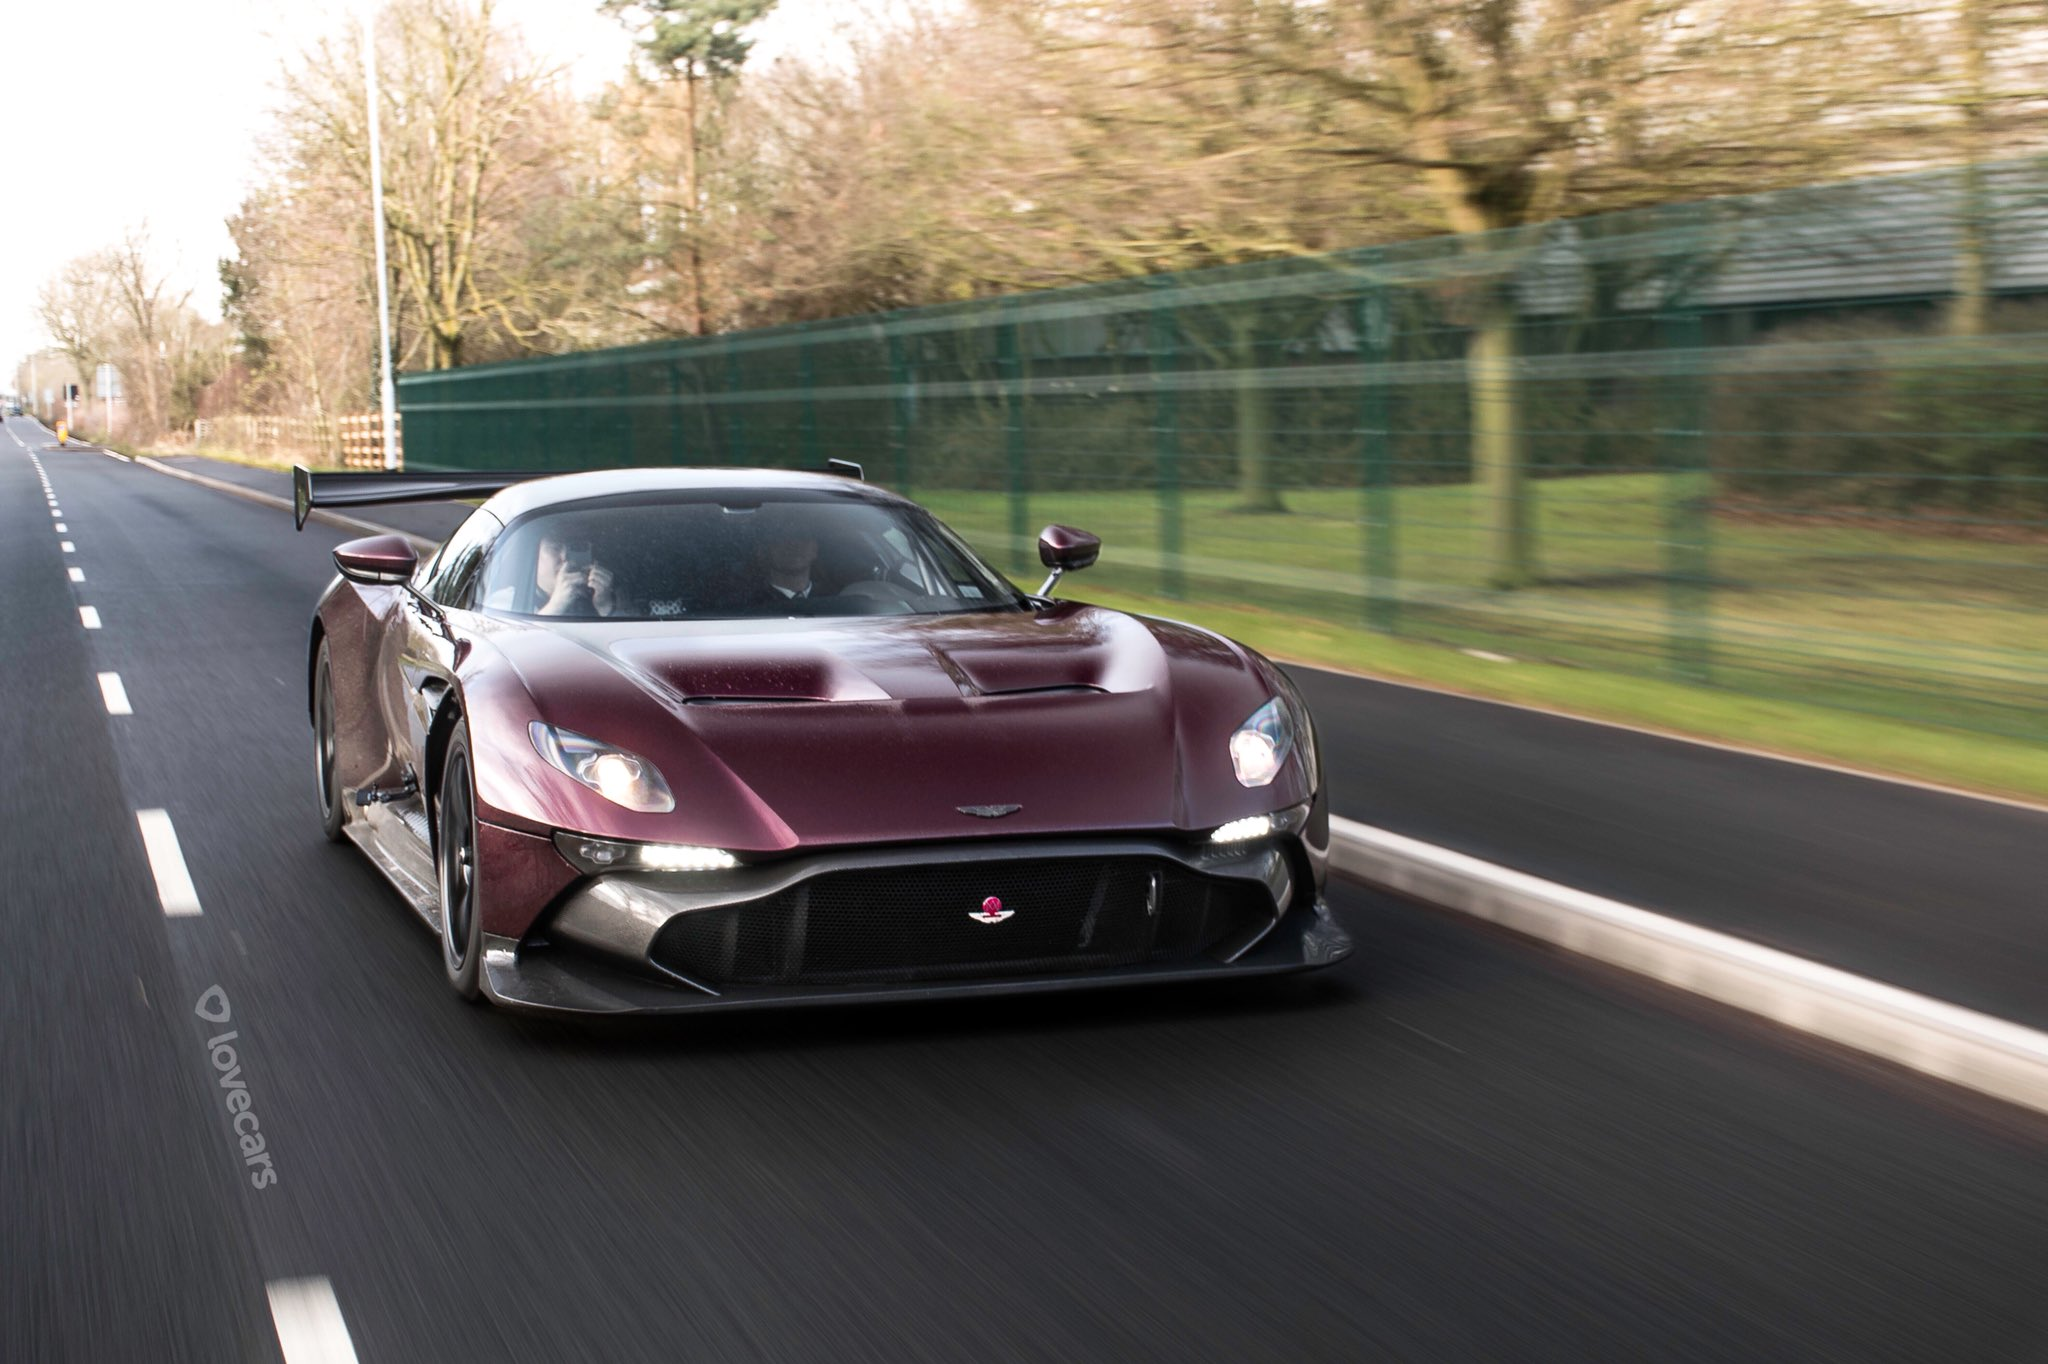 Aston Martin Vulcan street-legal (1)